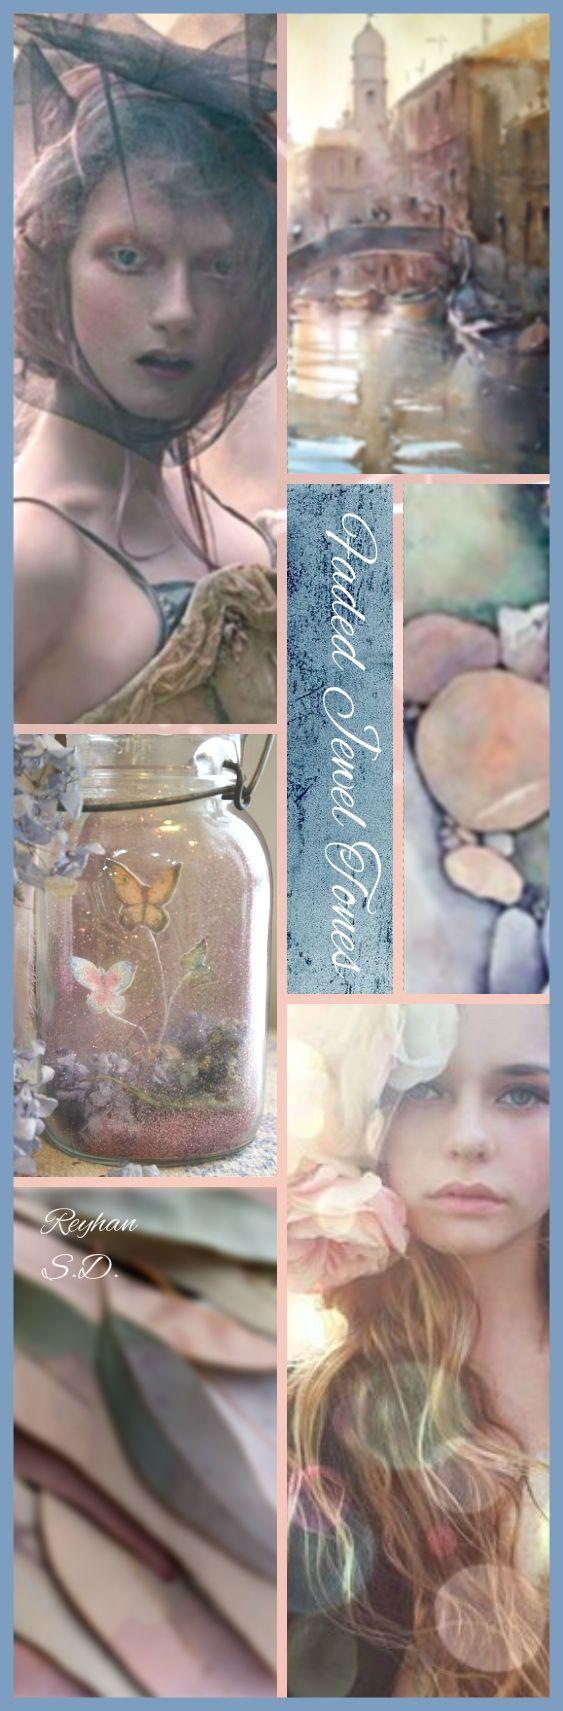 '' Faded Jewel Tones '' by Reyhan S.D.